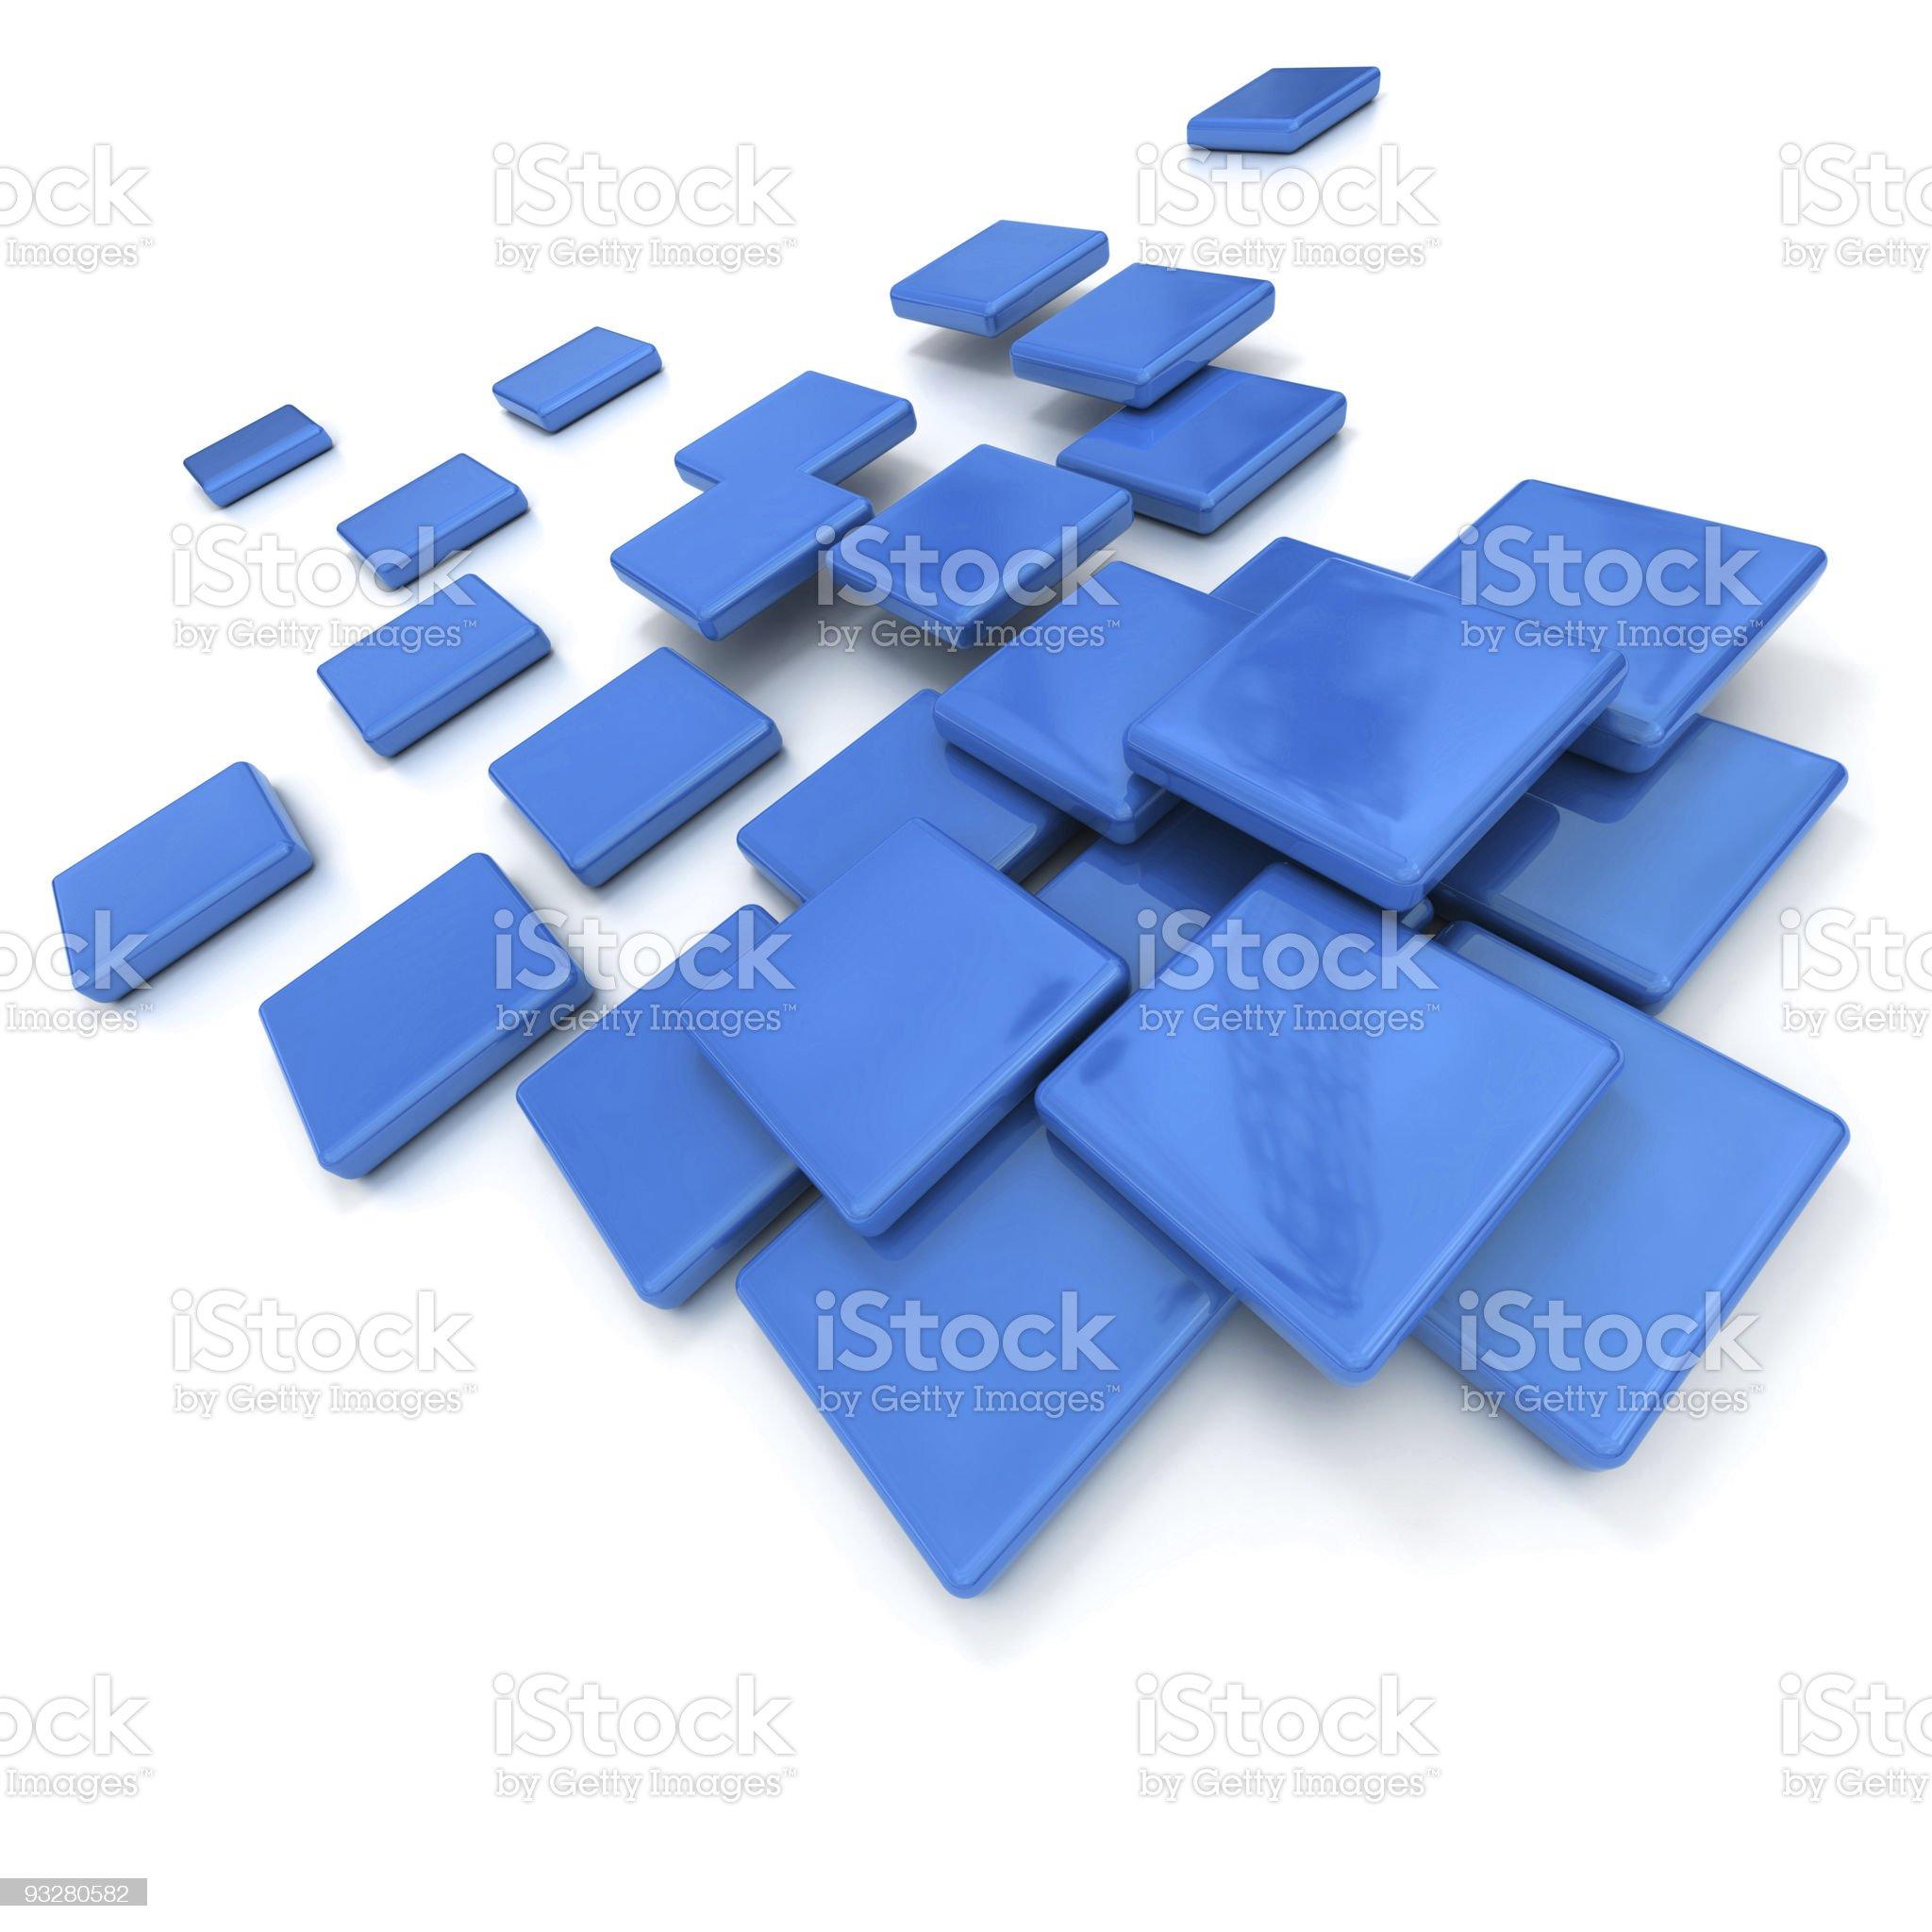 Blue ceramic tiles royalty-free stock vector art